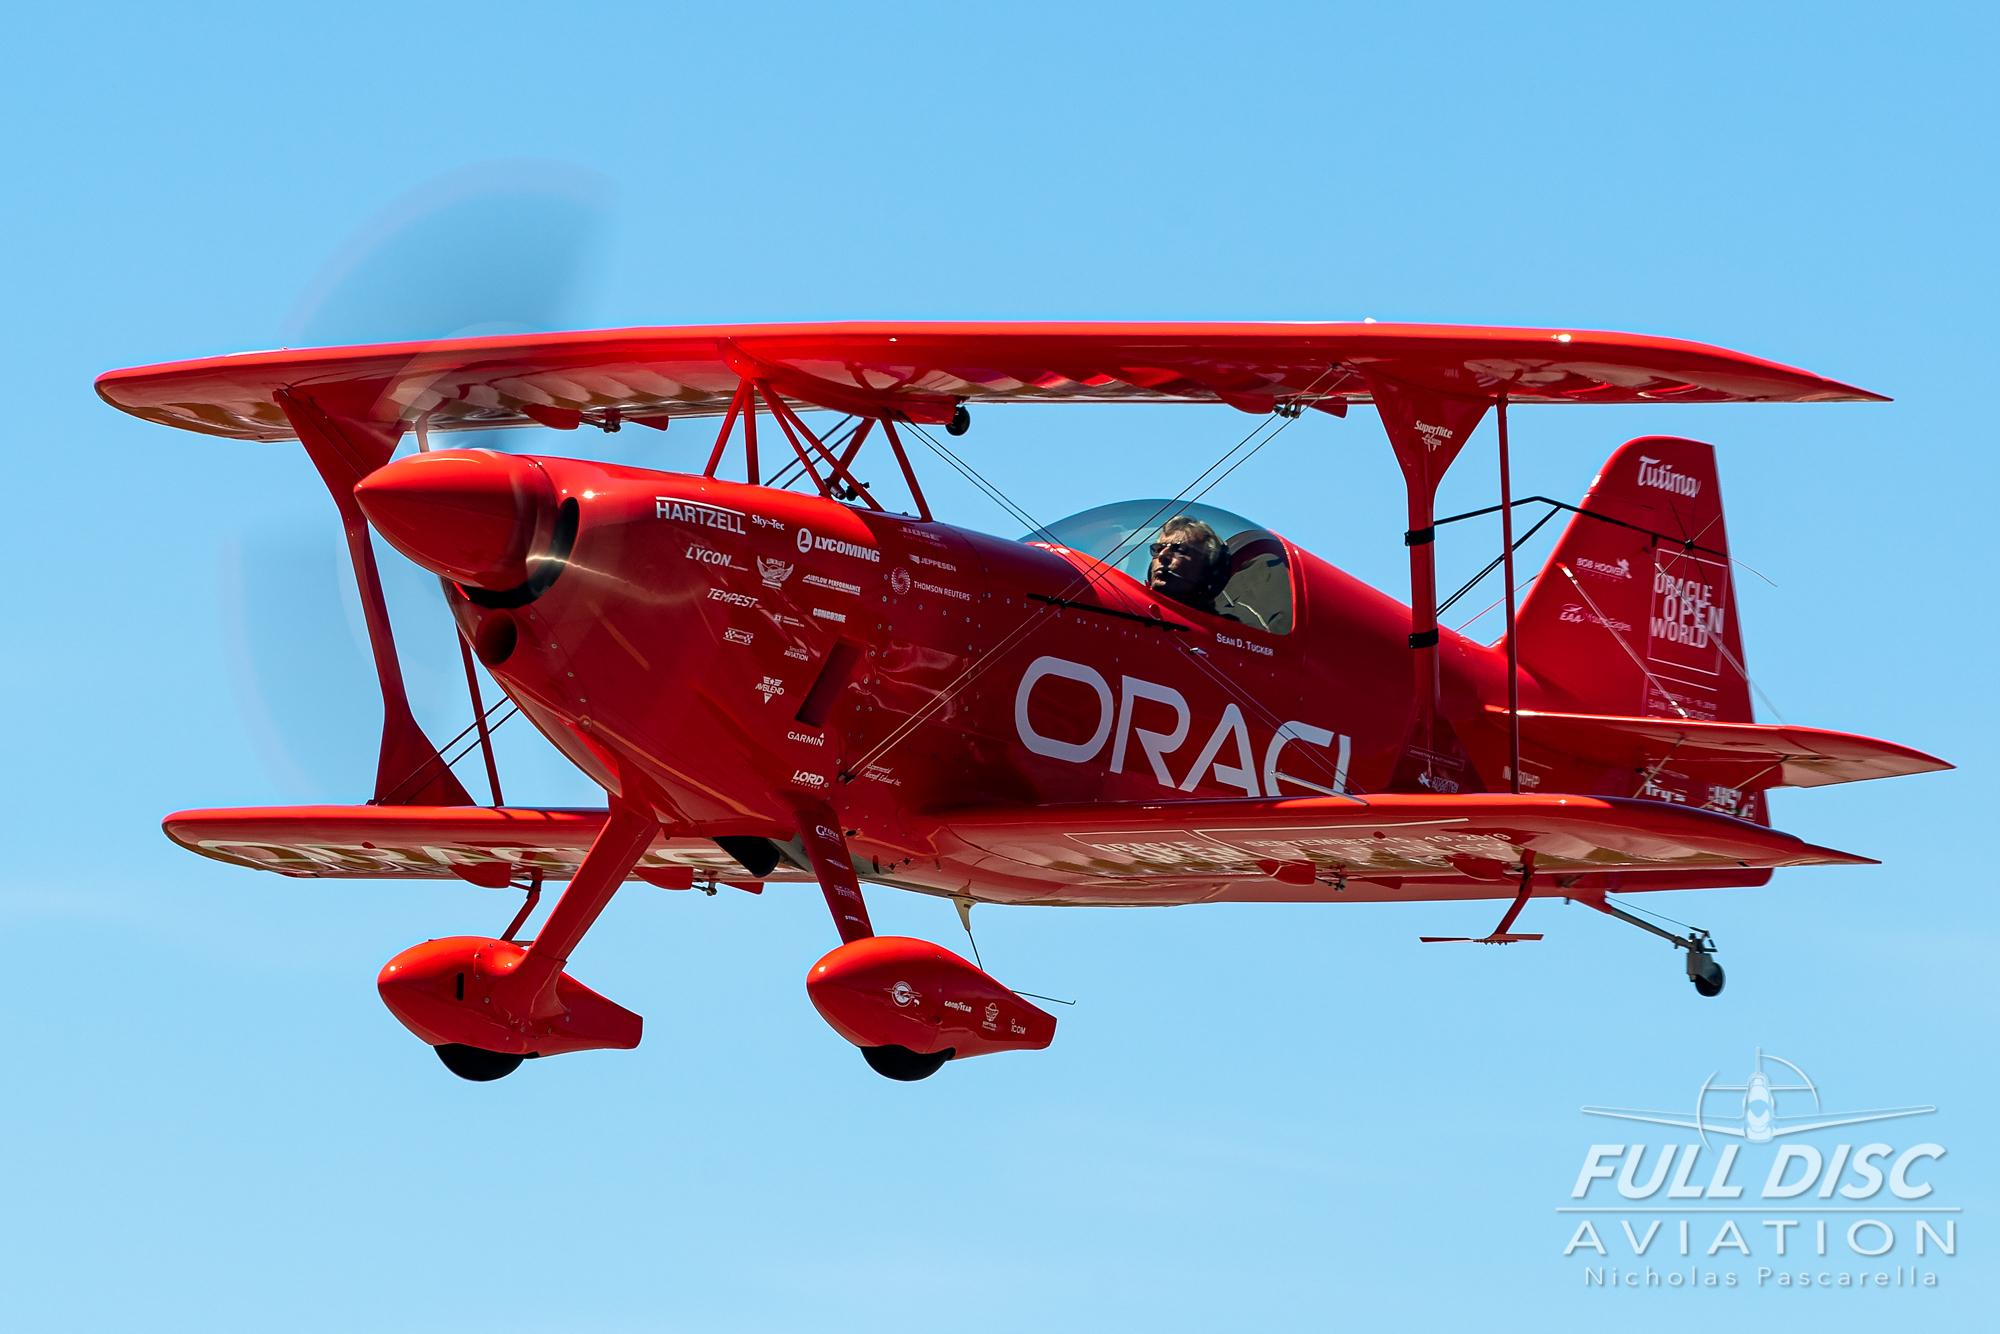 americanairpowermuseum_nicholaspascarella_nickpascarella_fulldiscaviation_legendsofairpower2019_aviation_warbird_seantucker_oracle_biplane_landing.jpg